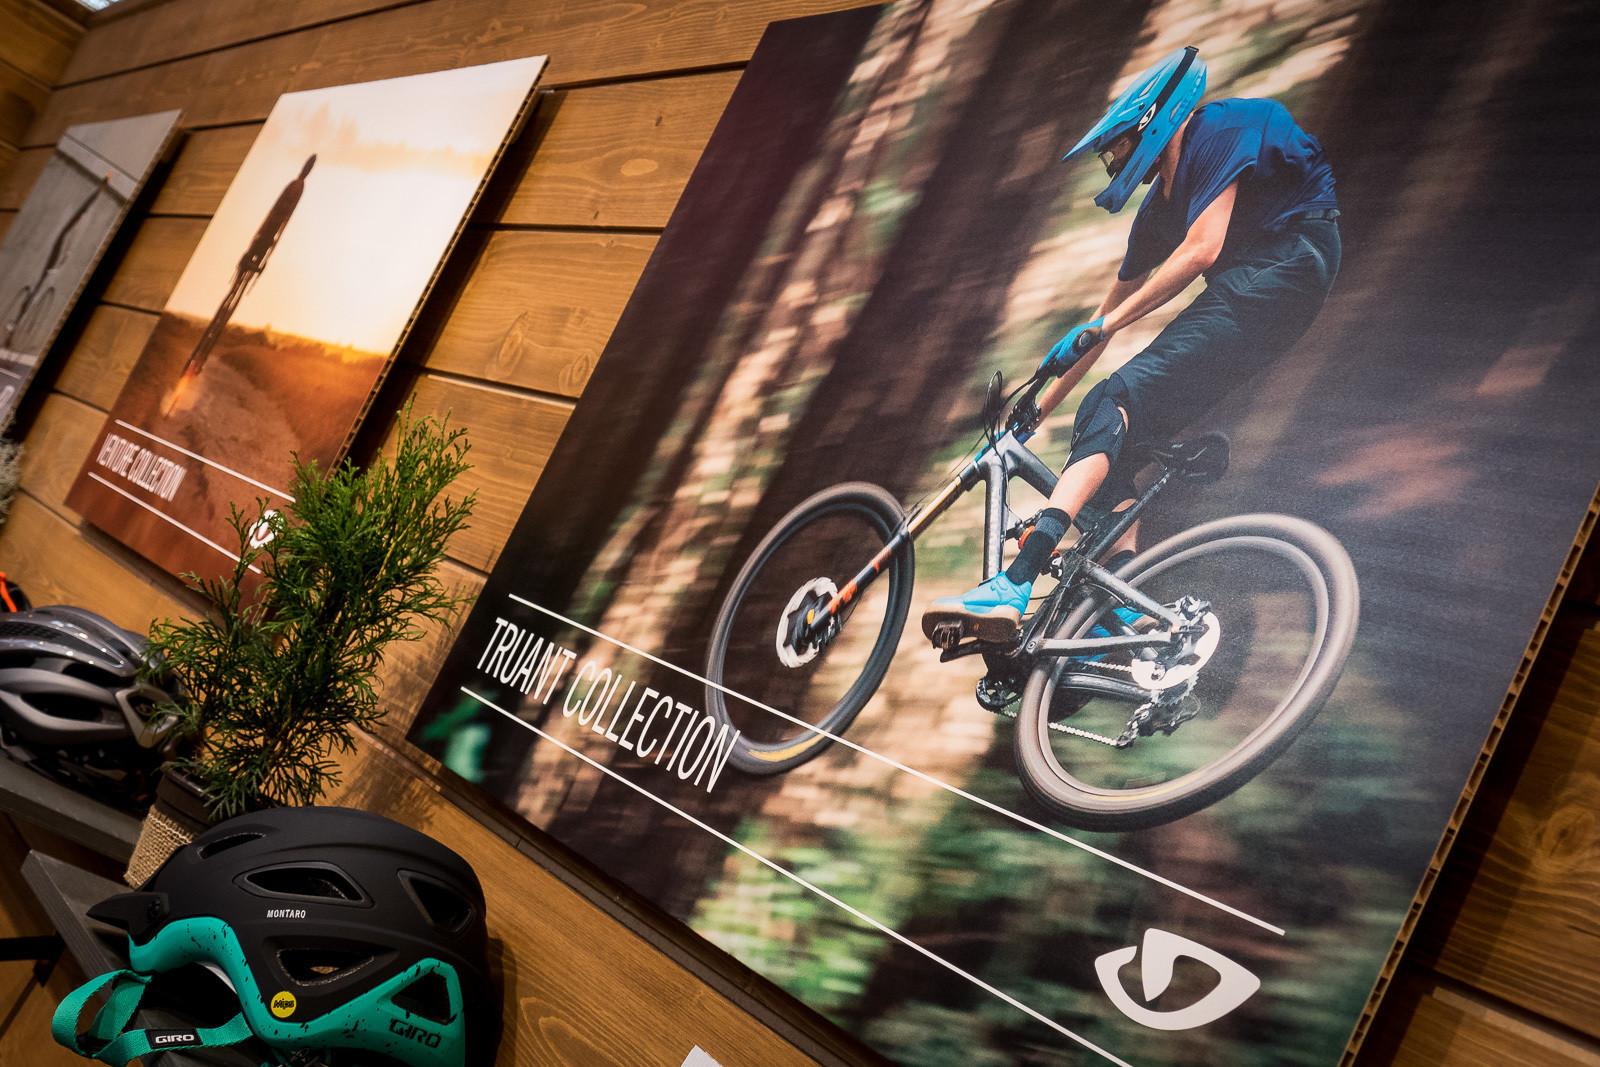 2016 Giro Truant MTB Gear - 2016 Mountain Bike Apparel & Protection at Eurobike - Mountain Biking Pictures - Vital MTB